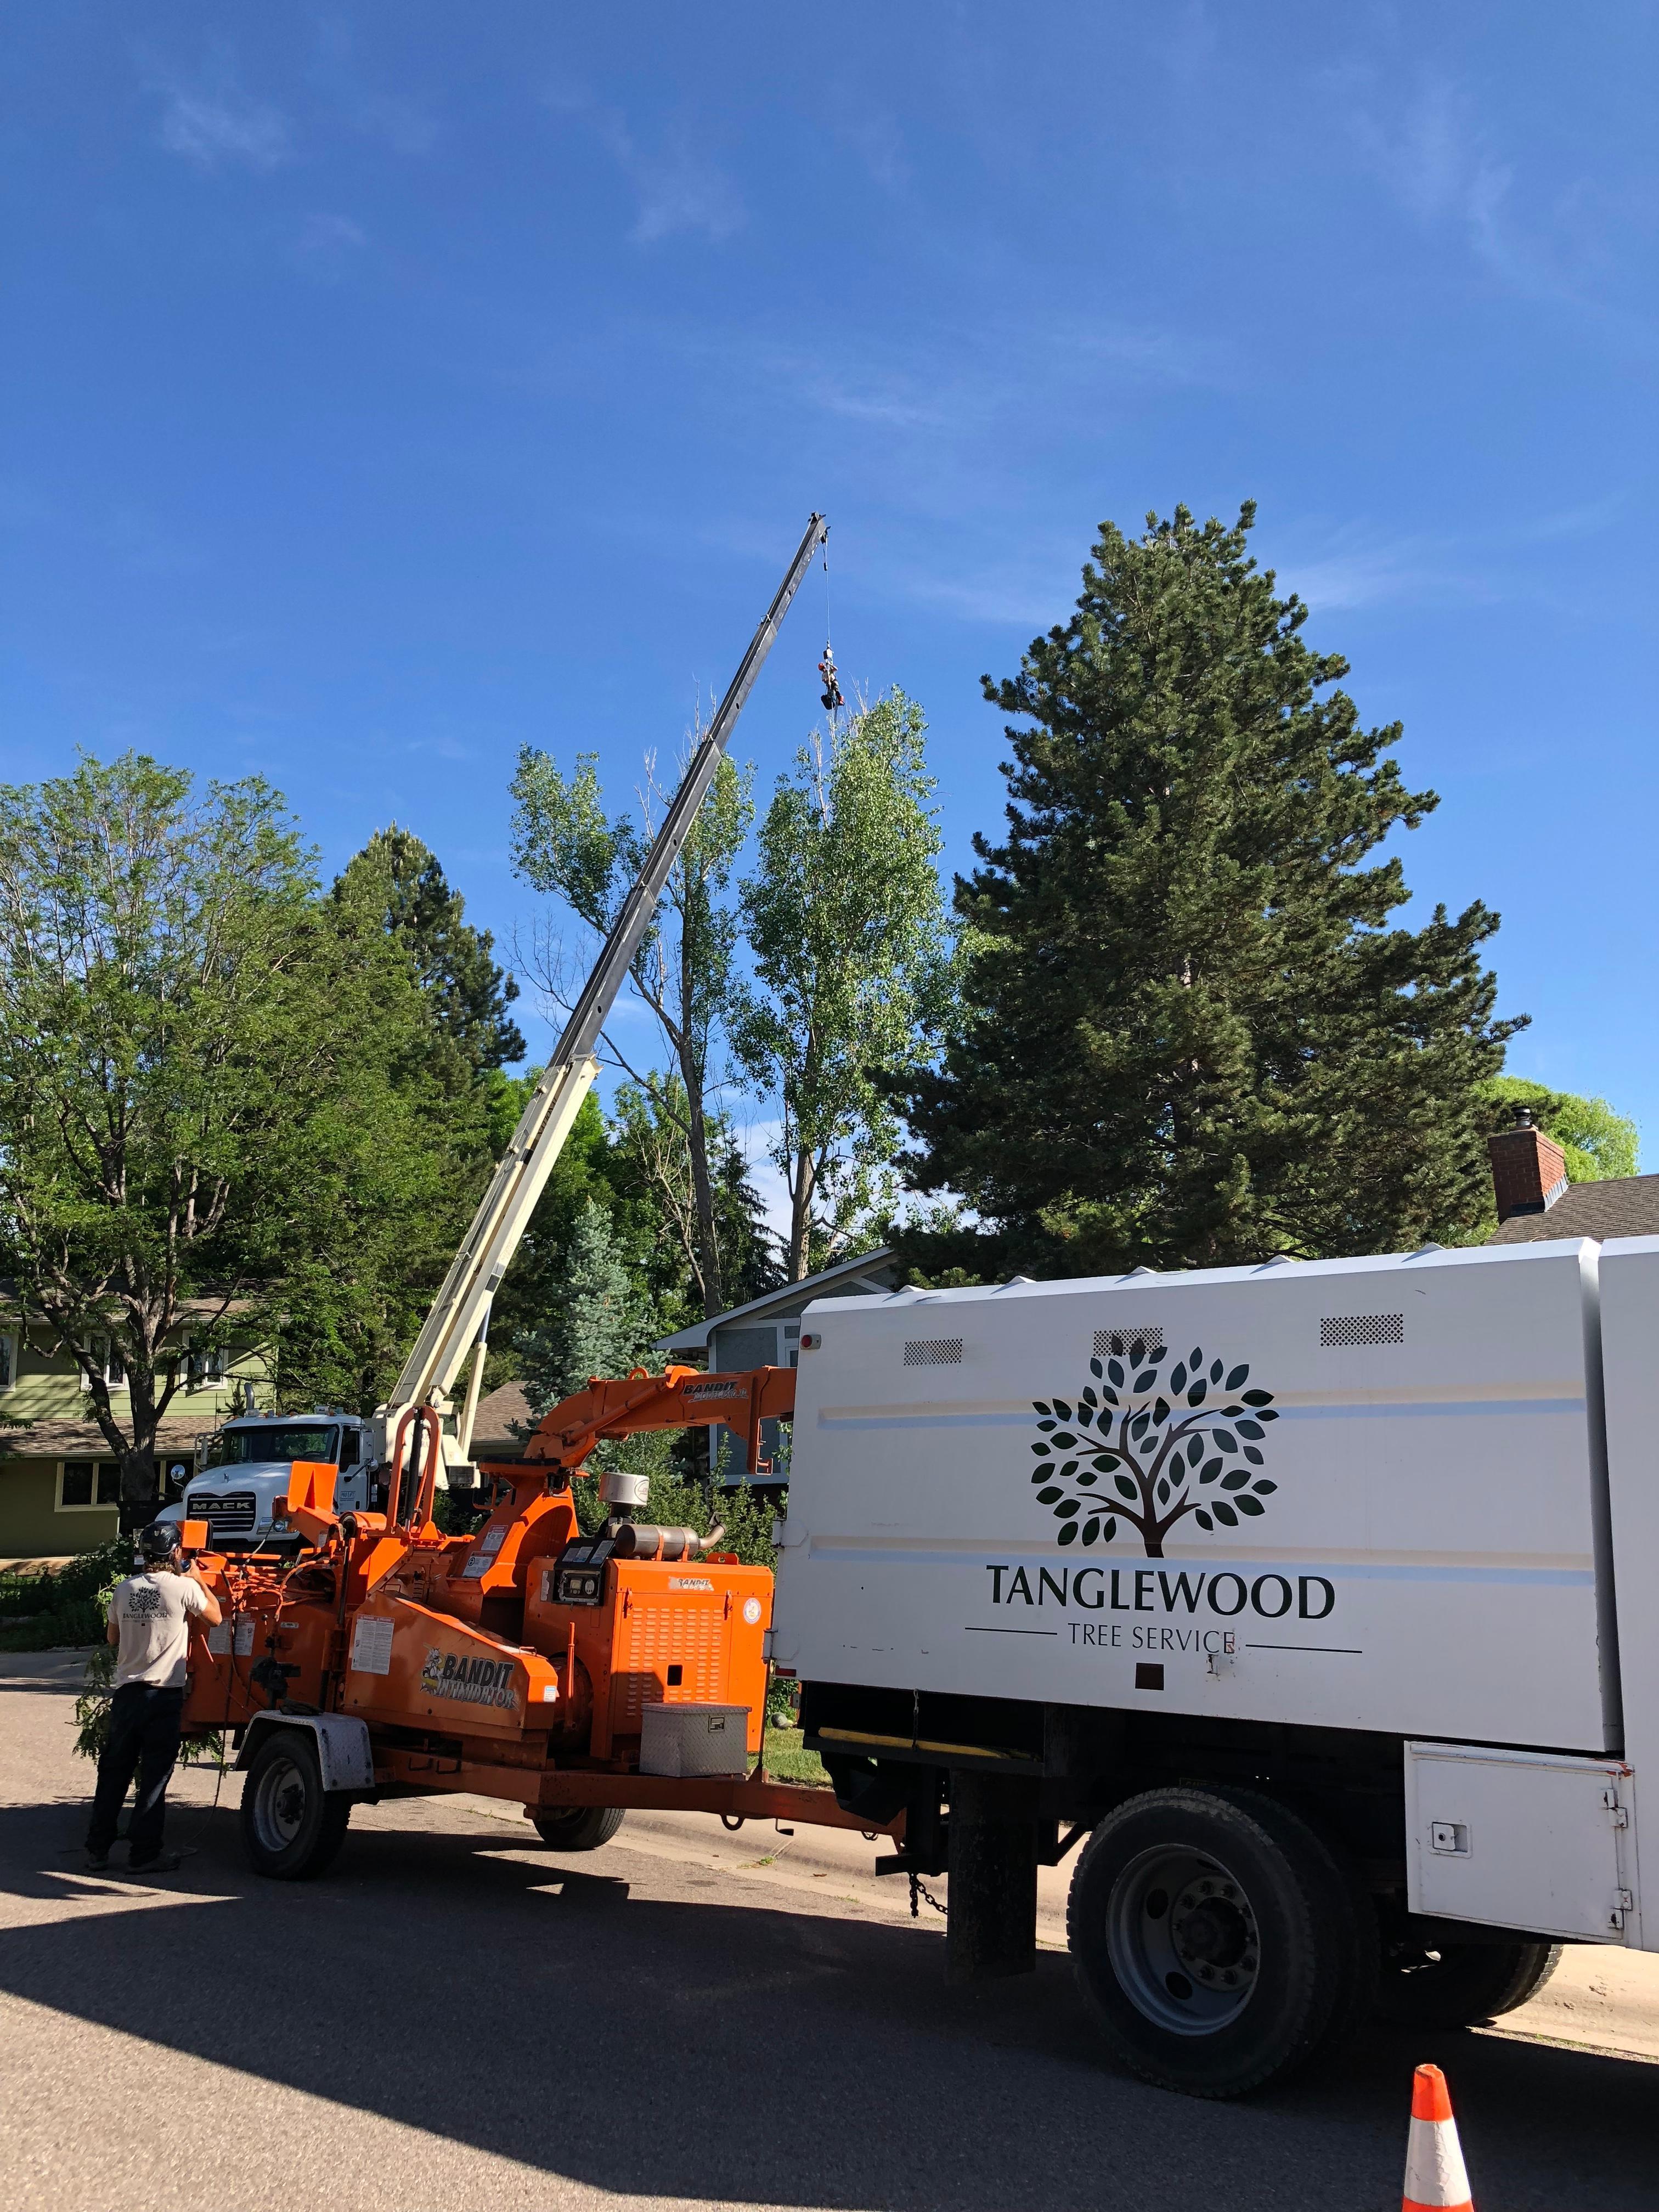 Tanglewood Tree Service image 1